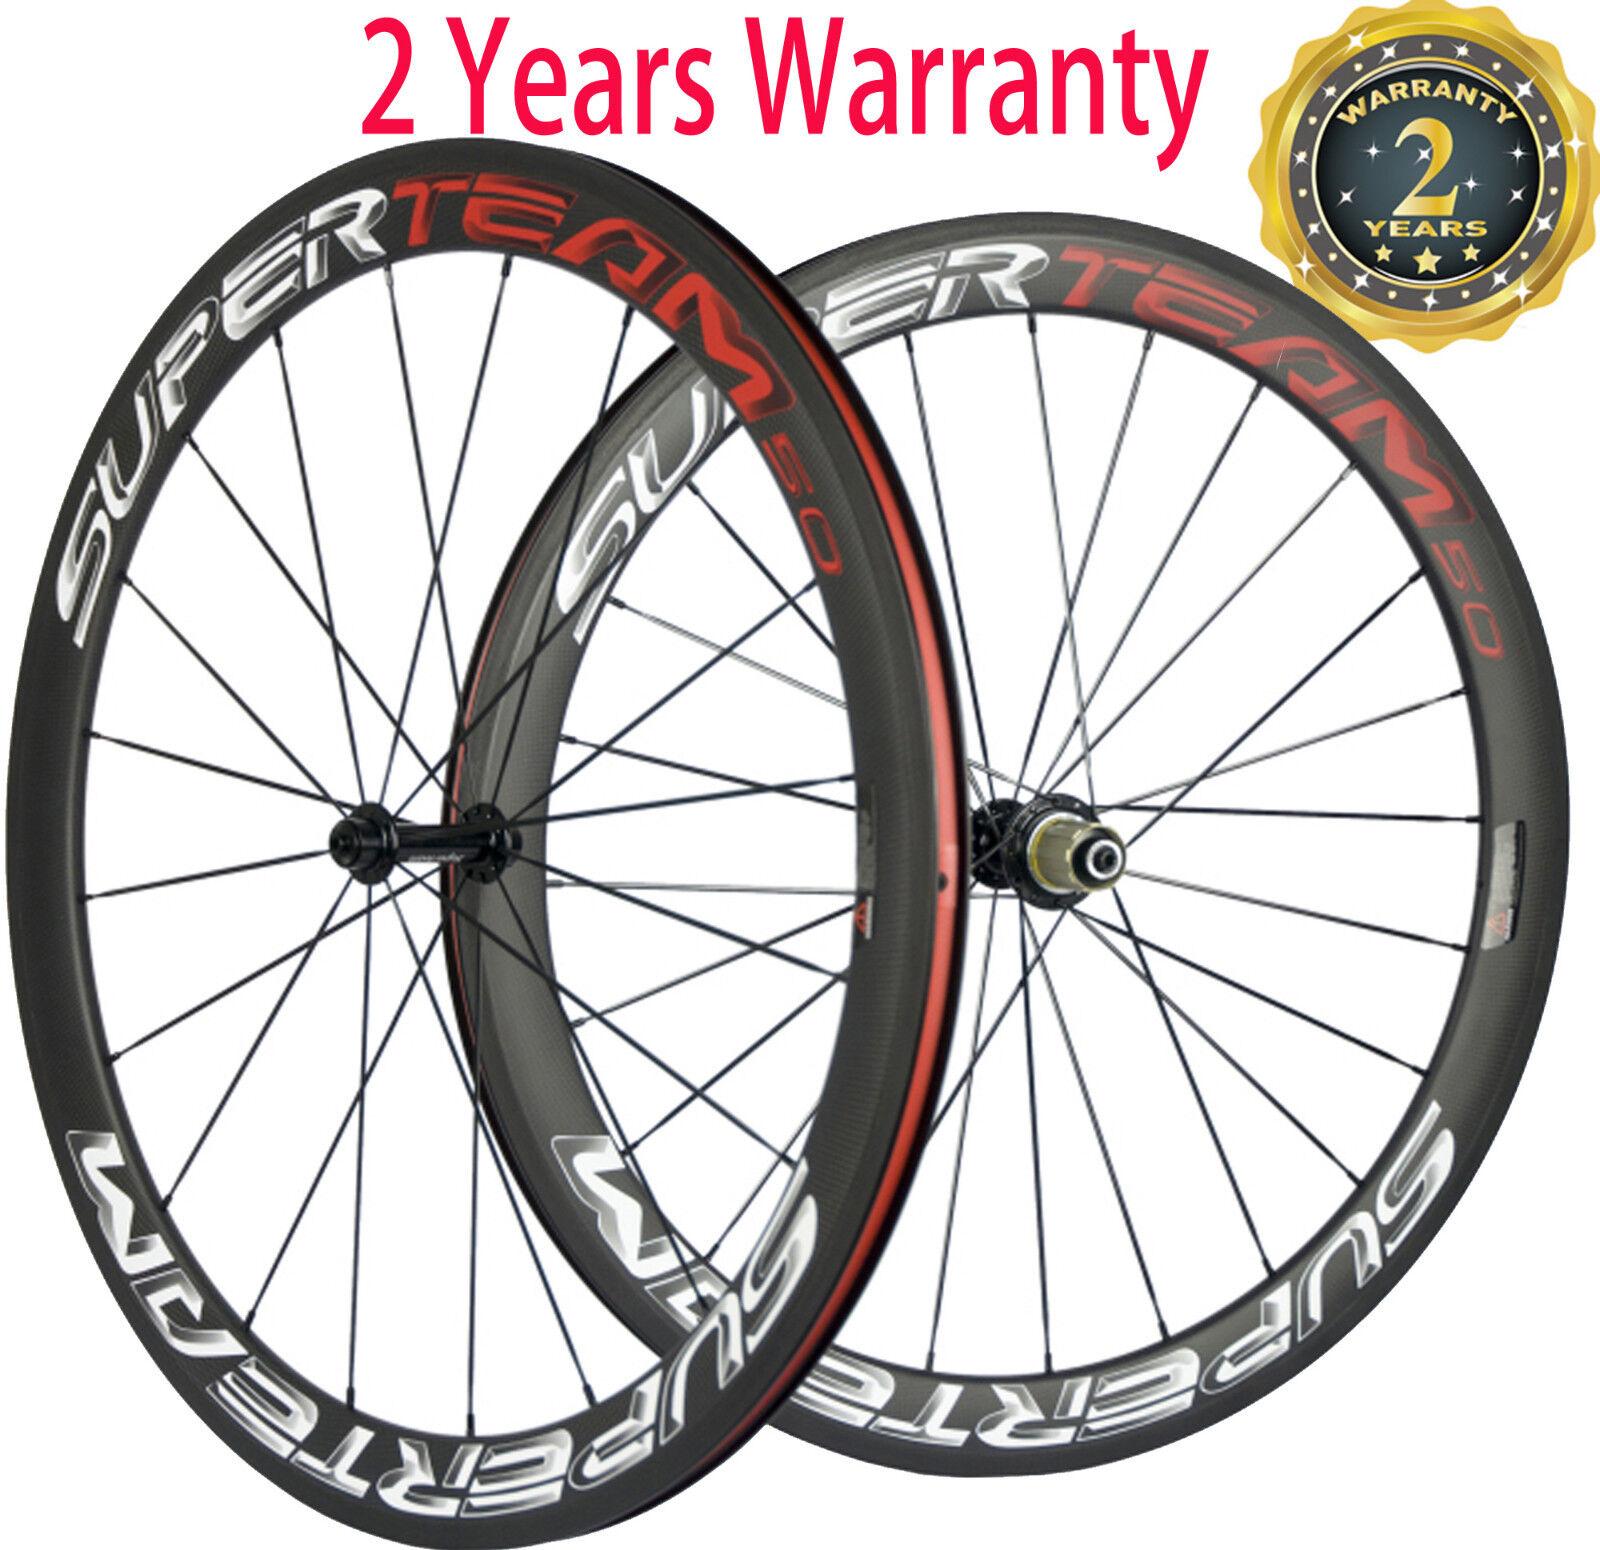 Superteam 50mm Carbon Fiber Road Bike Clincher  Wheels 23mm Bicycle Wheelset  store online